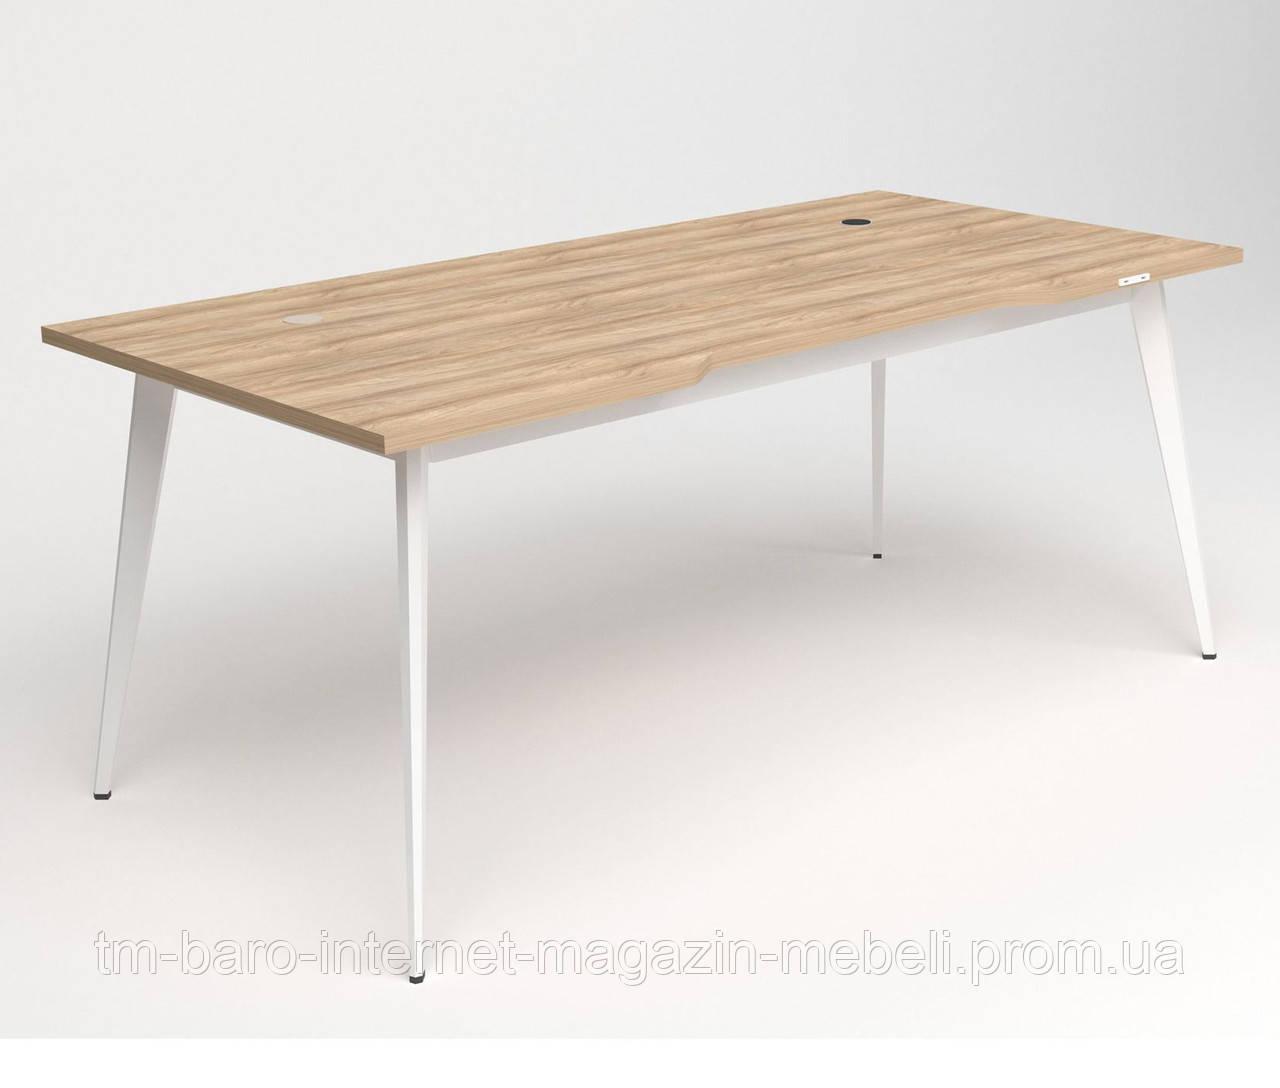 Стол+USB Delta DL-107 (1790х900х750мм) Блэквуд Ячменный/Каркас белый